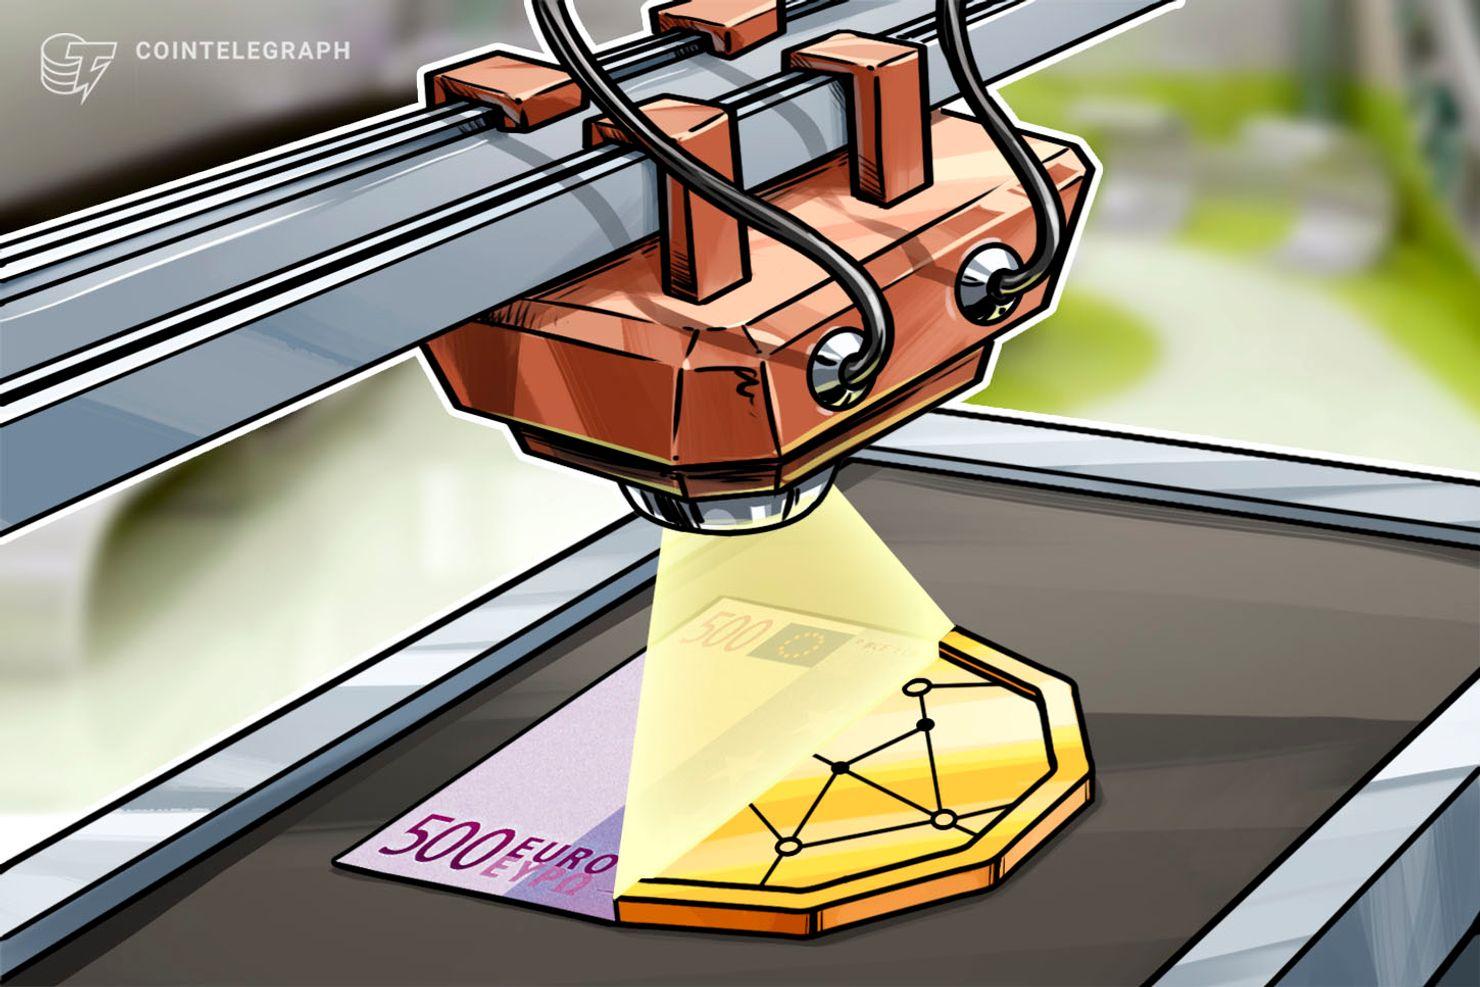 Crypto Exchange Binance Enters European Markets, Launches Binance Jersey